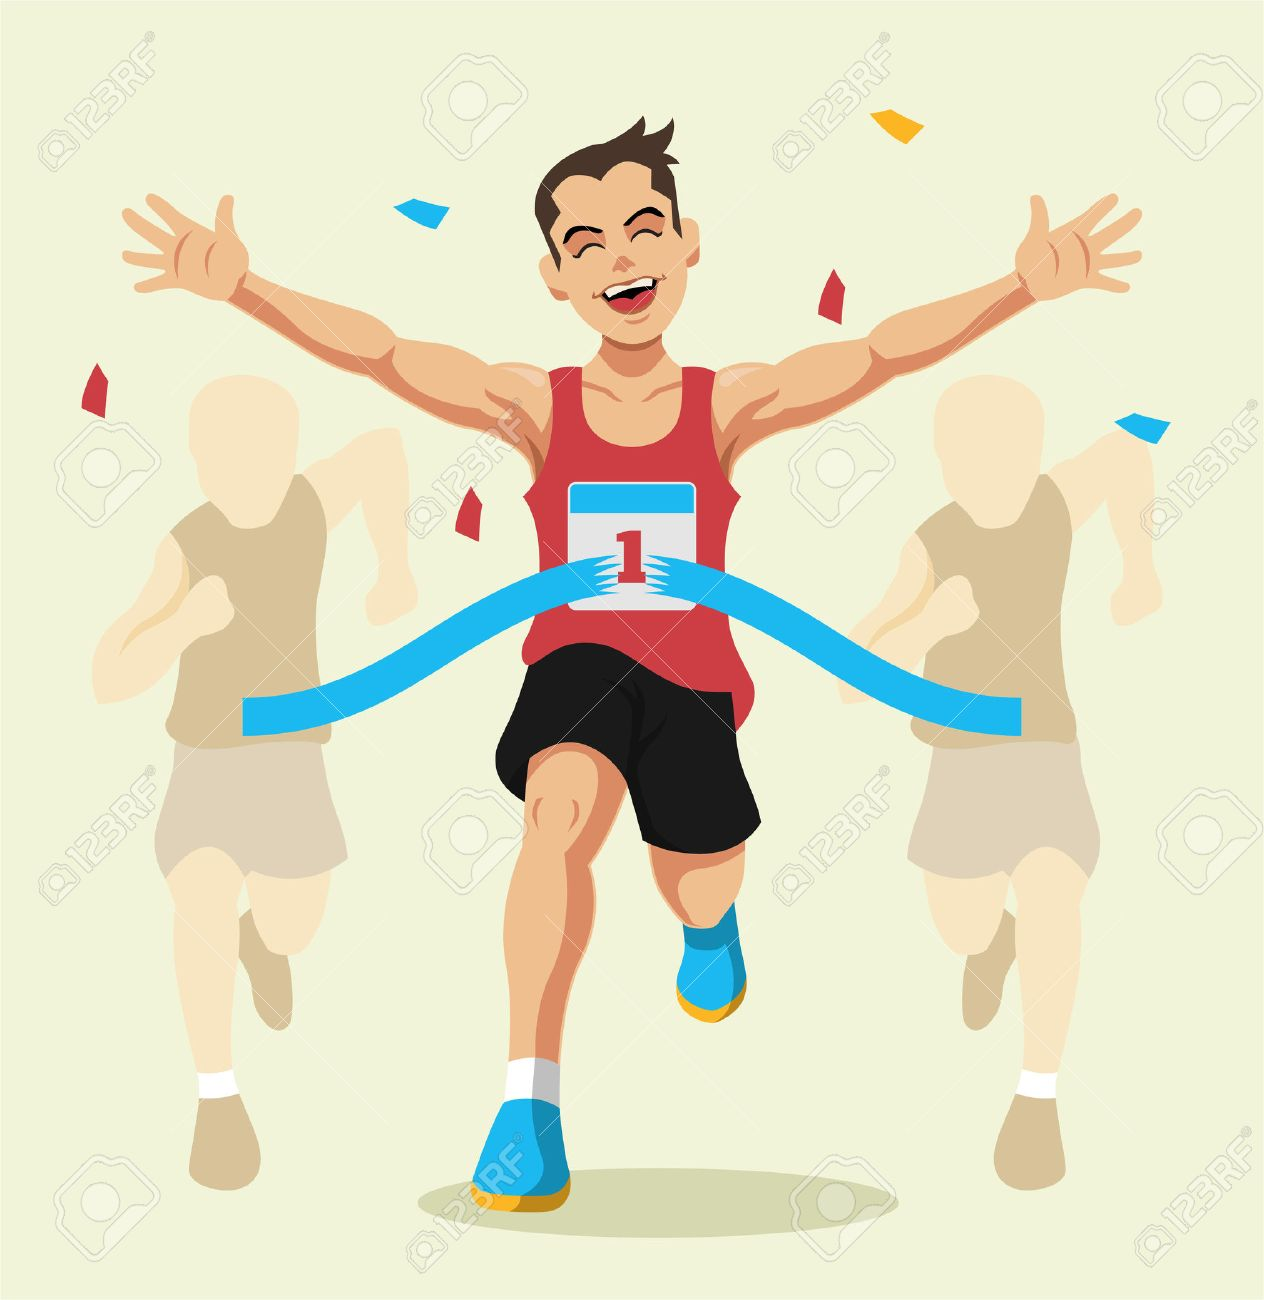 Man winning a race. Vector flat illustration - 45454142